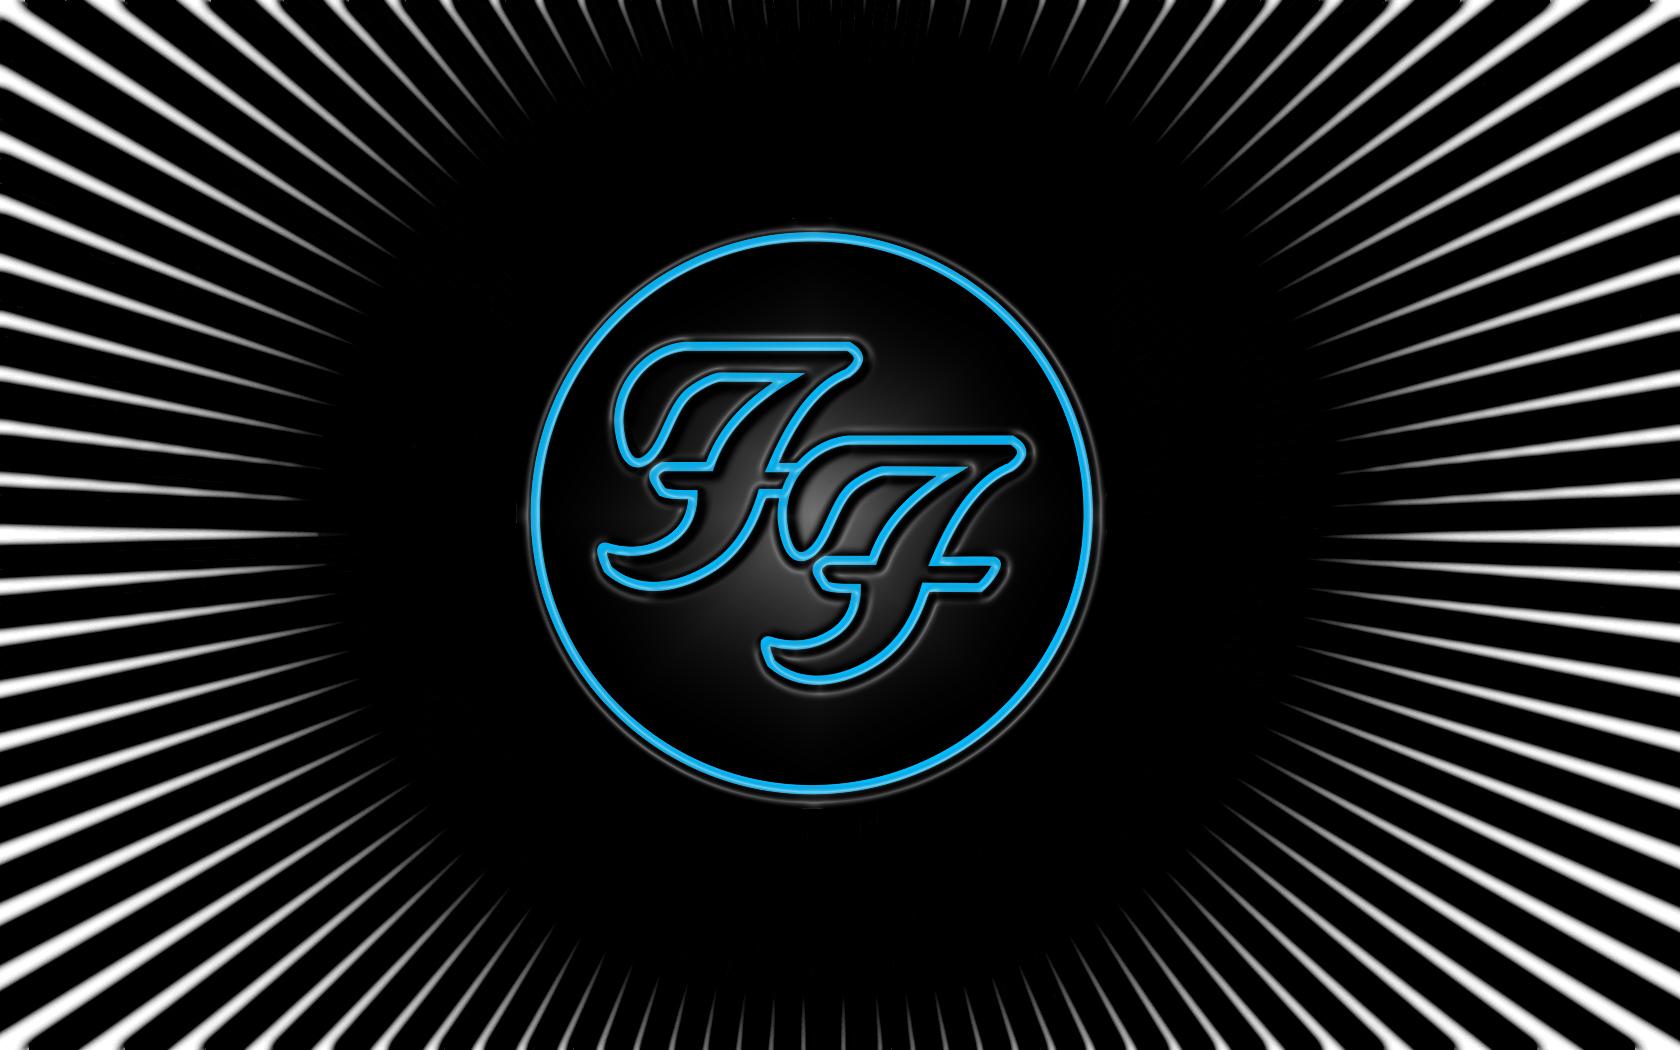 Foo Fighters Wallpapers   Taringa 1680x1050